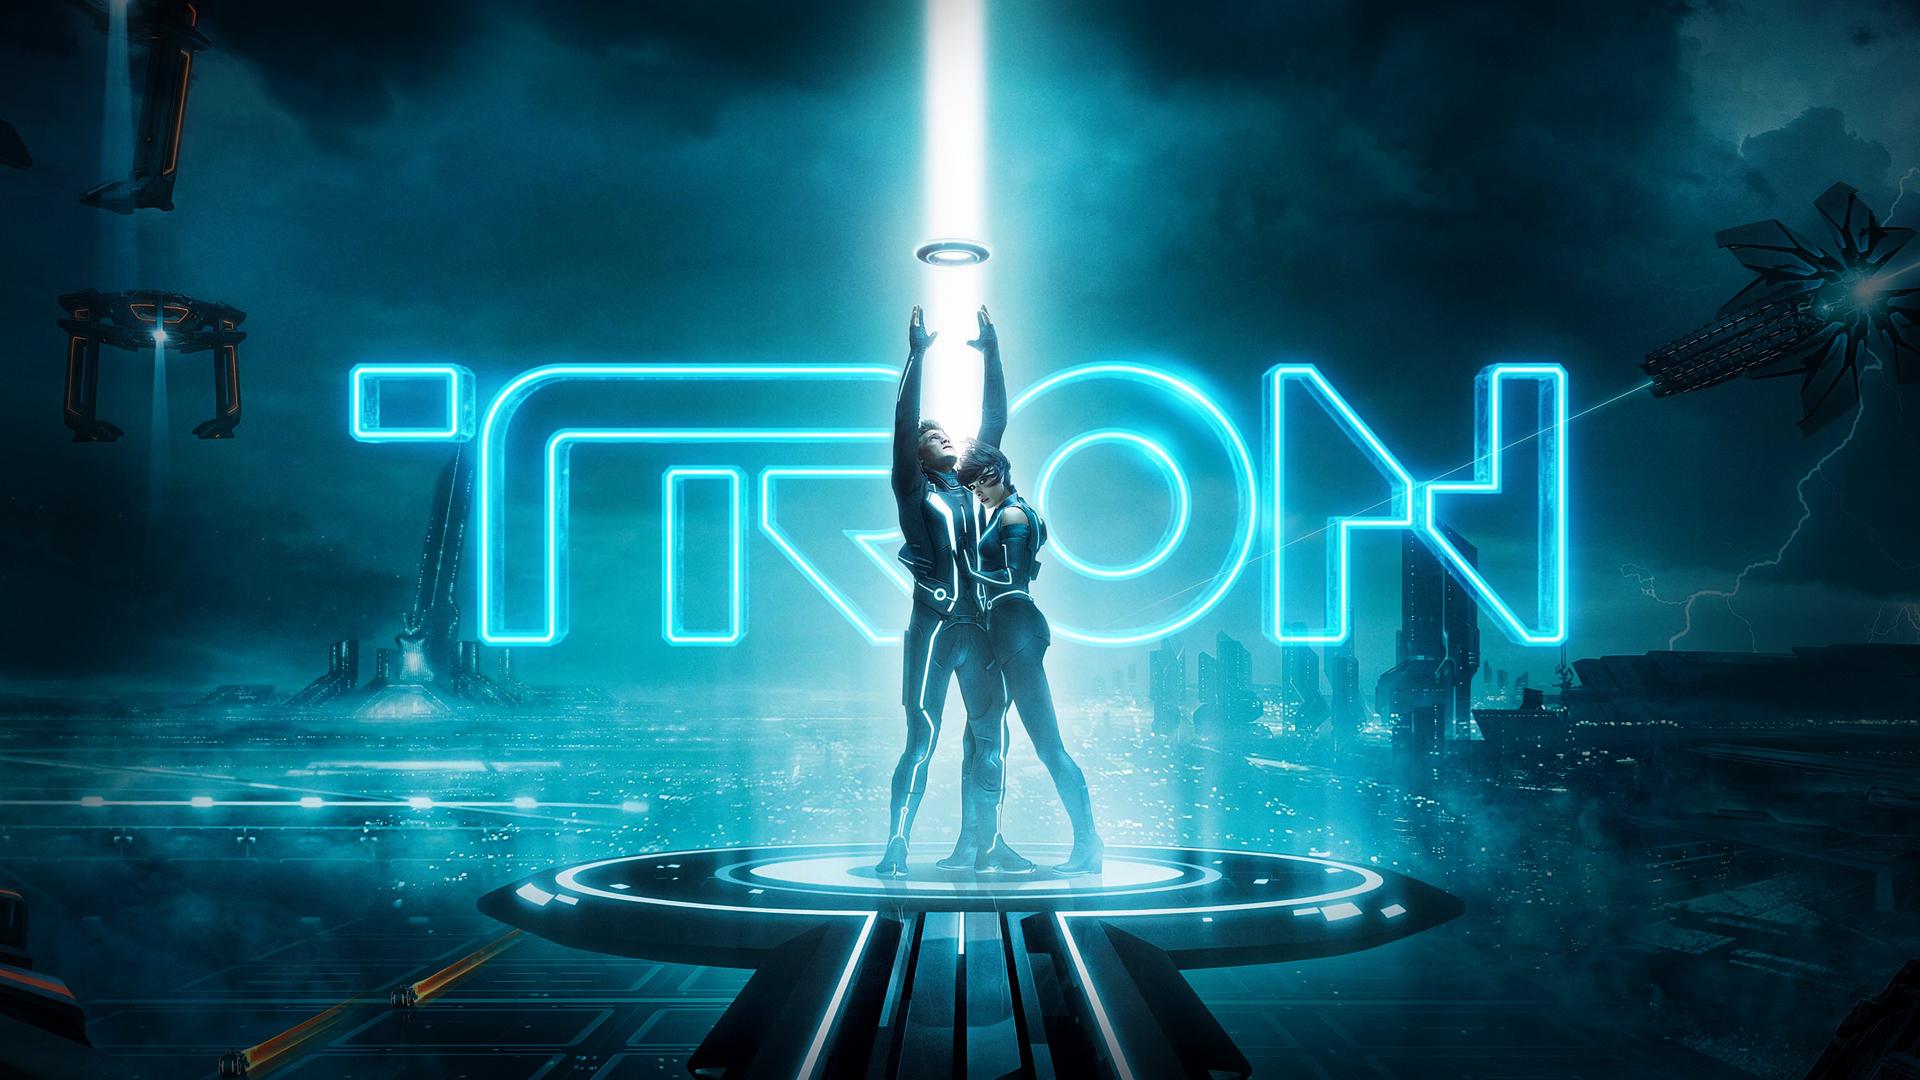 tron-legacy-wallpaper-widescreen.jpg